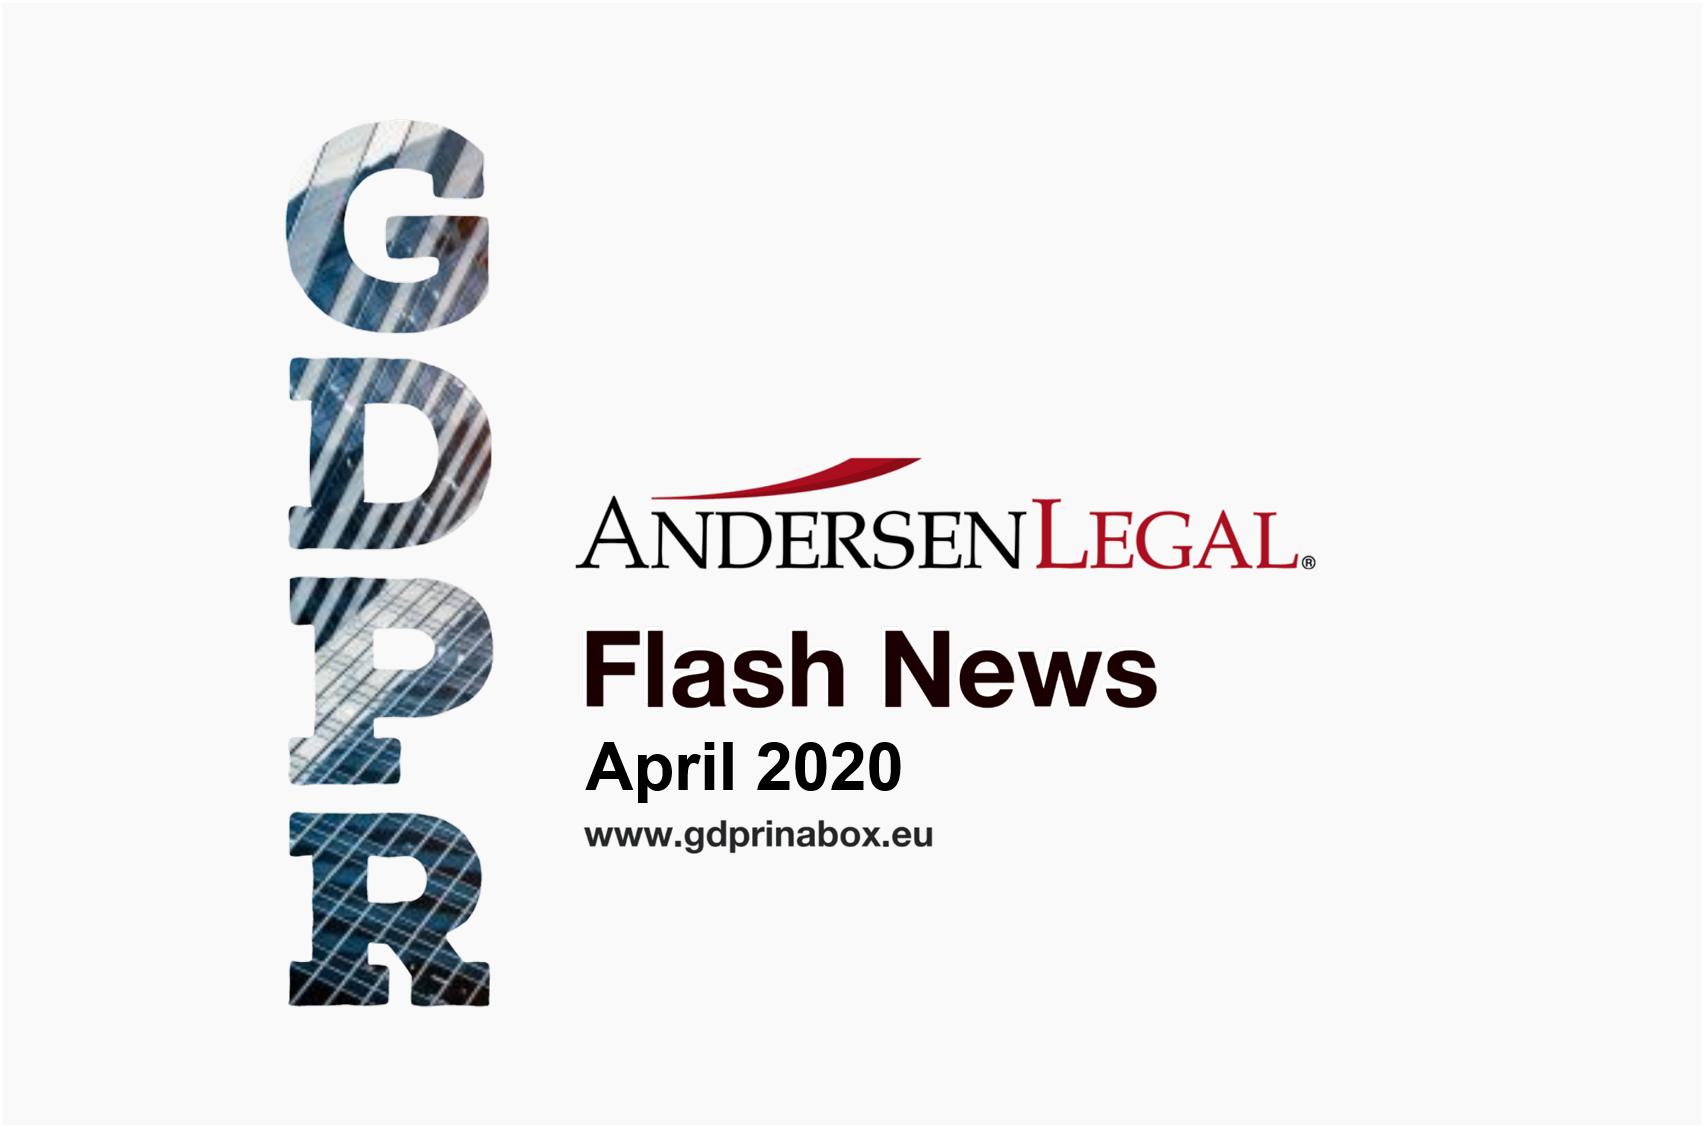 GDPR Flash News: Swedish Data Protection Authority imposing a fine on Google